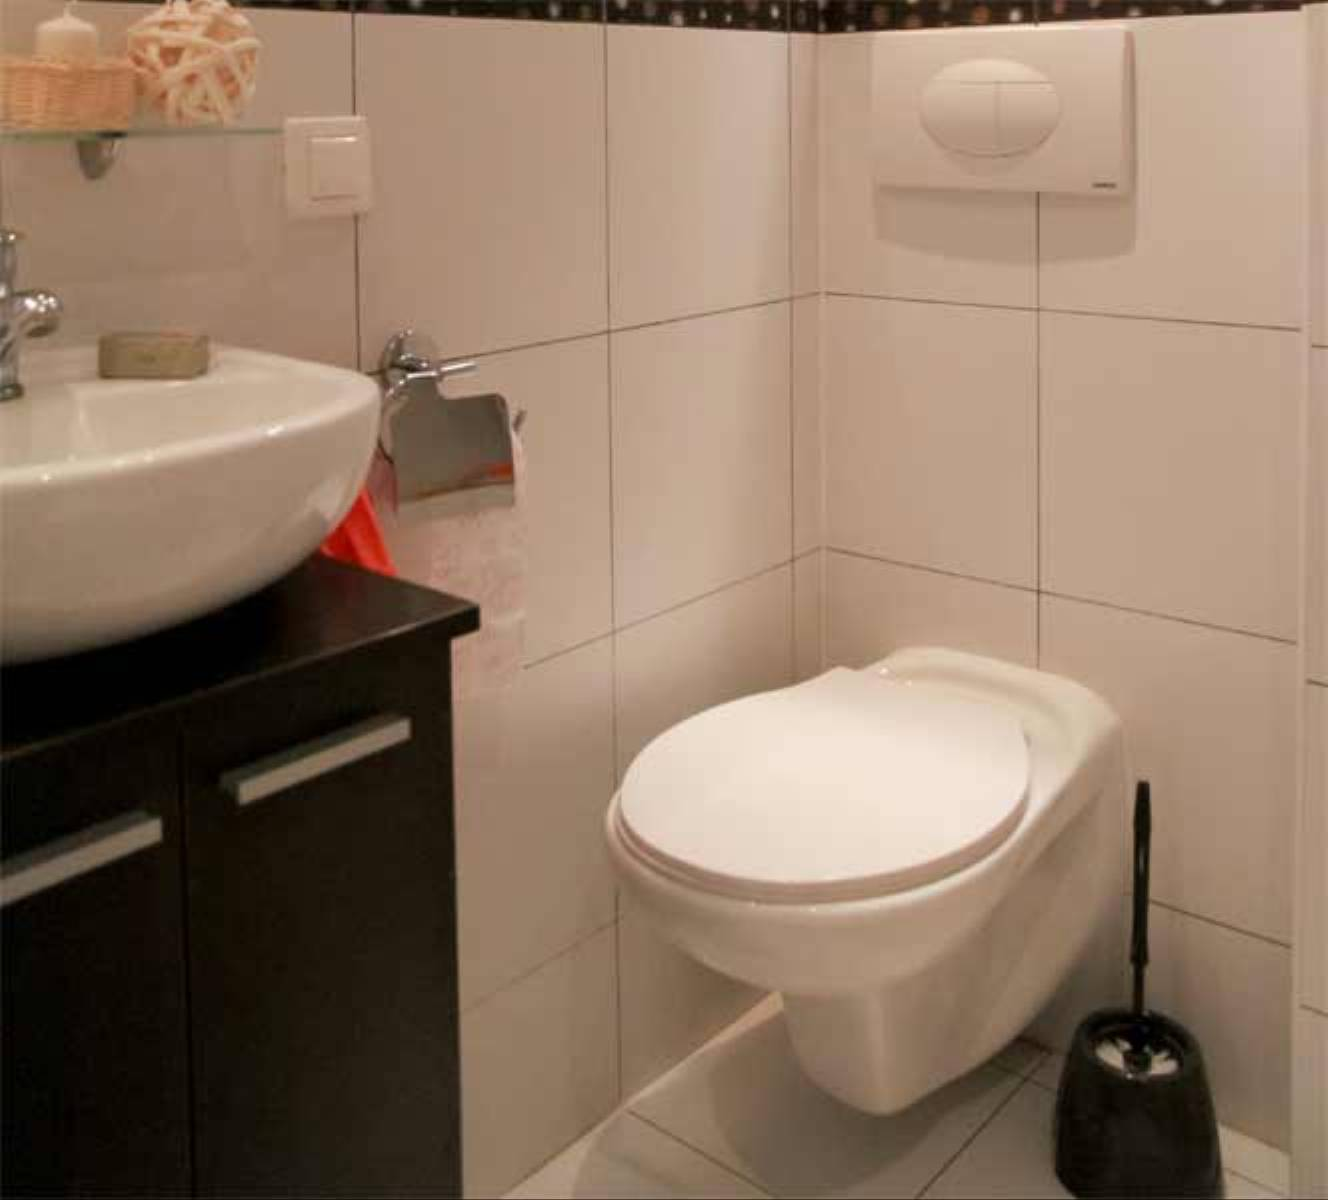 Groźne dla skóry miejsca w łazience